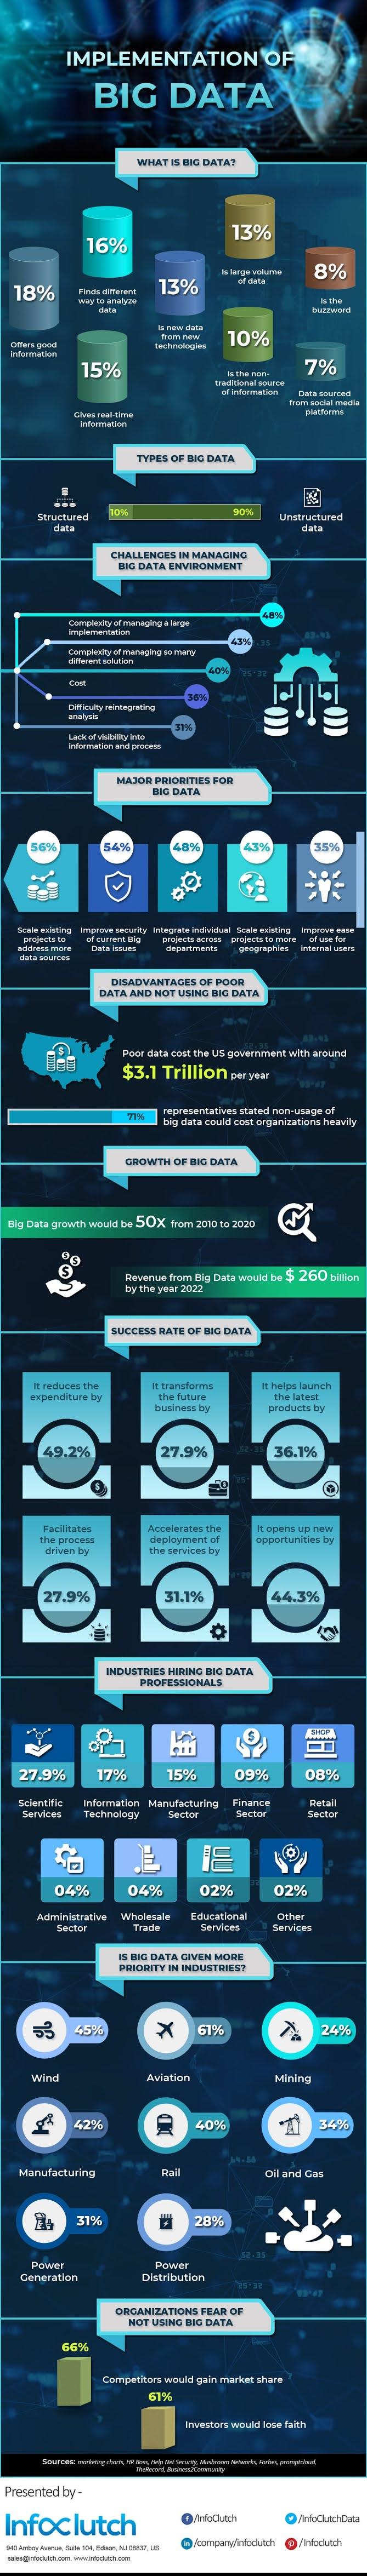 Implementation of Big Data #infographic #Technology #Big Data #Data